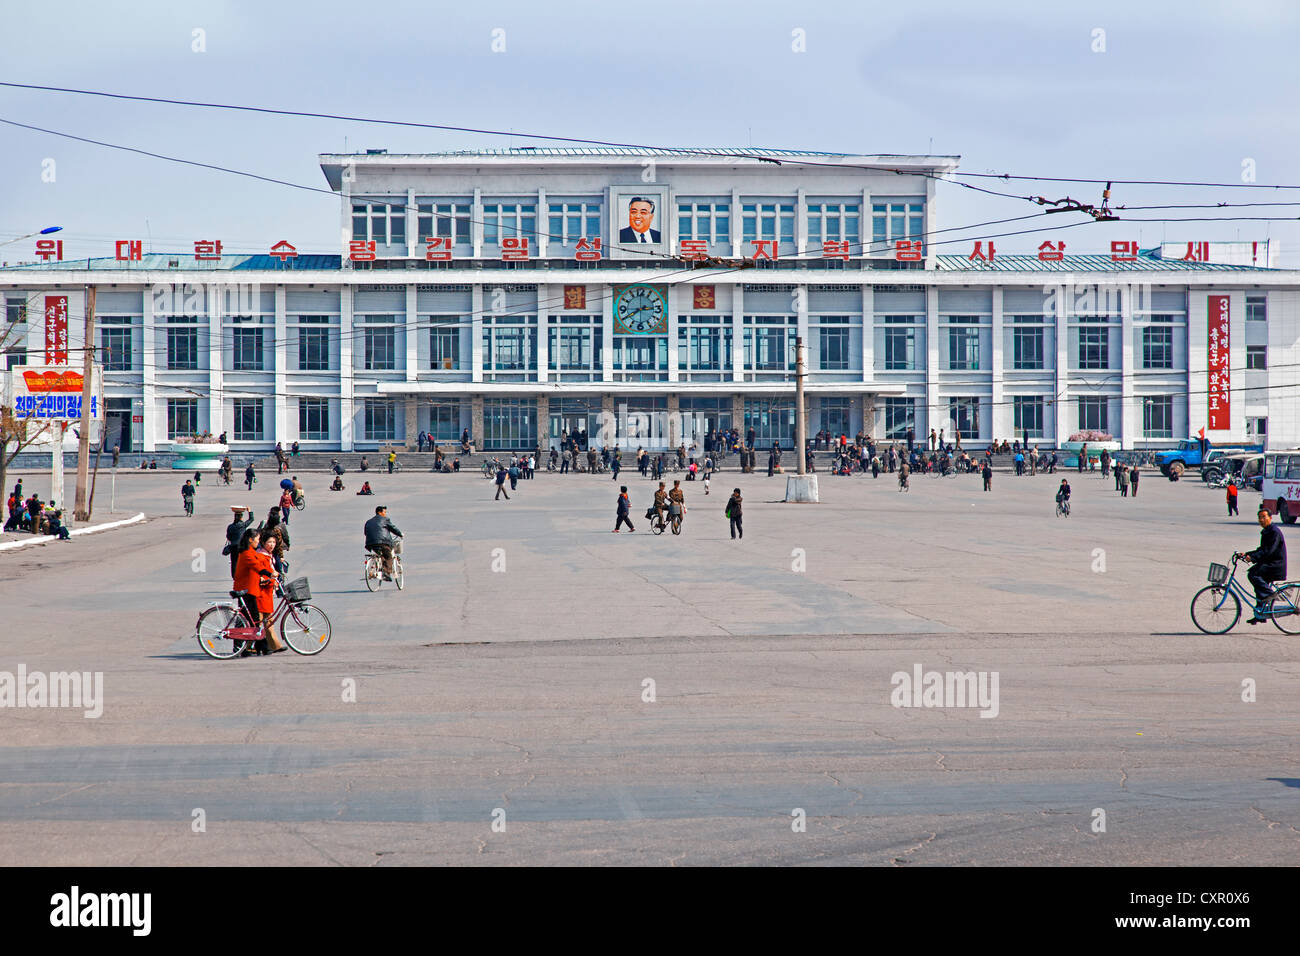 Democratic Peoples's Republic of Korea (DPRK), North Korea, Hamhung, Hamhung train station - Stock Image